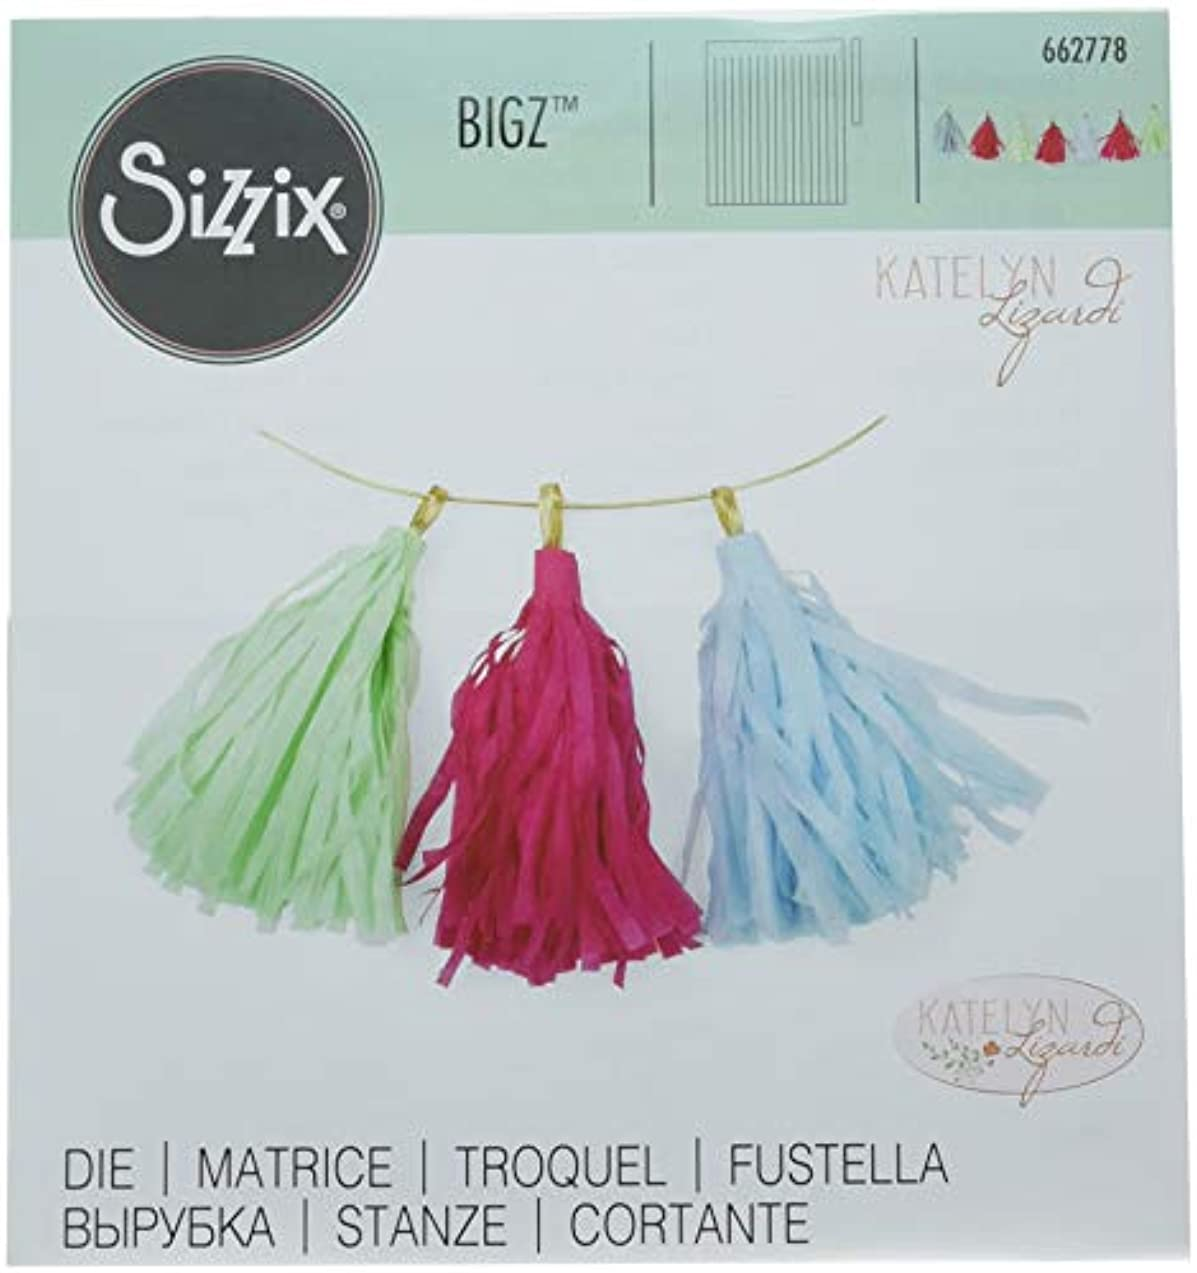 Sizzix (SIZC7) 662778 Big Die, Multi-Colored